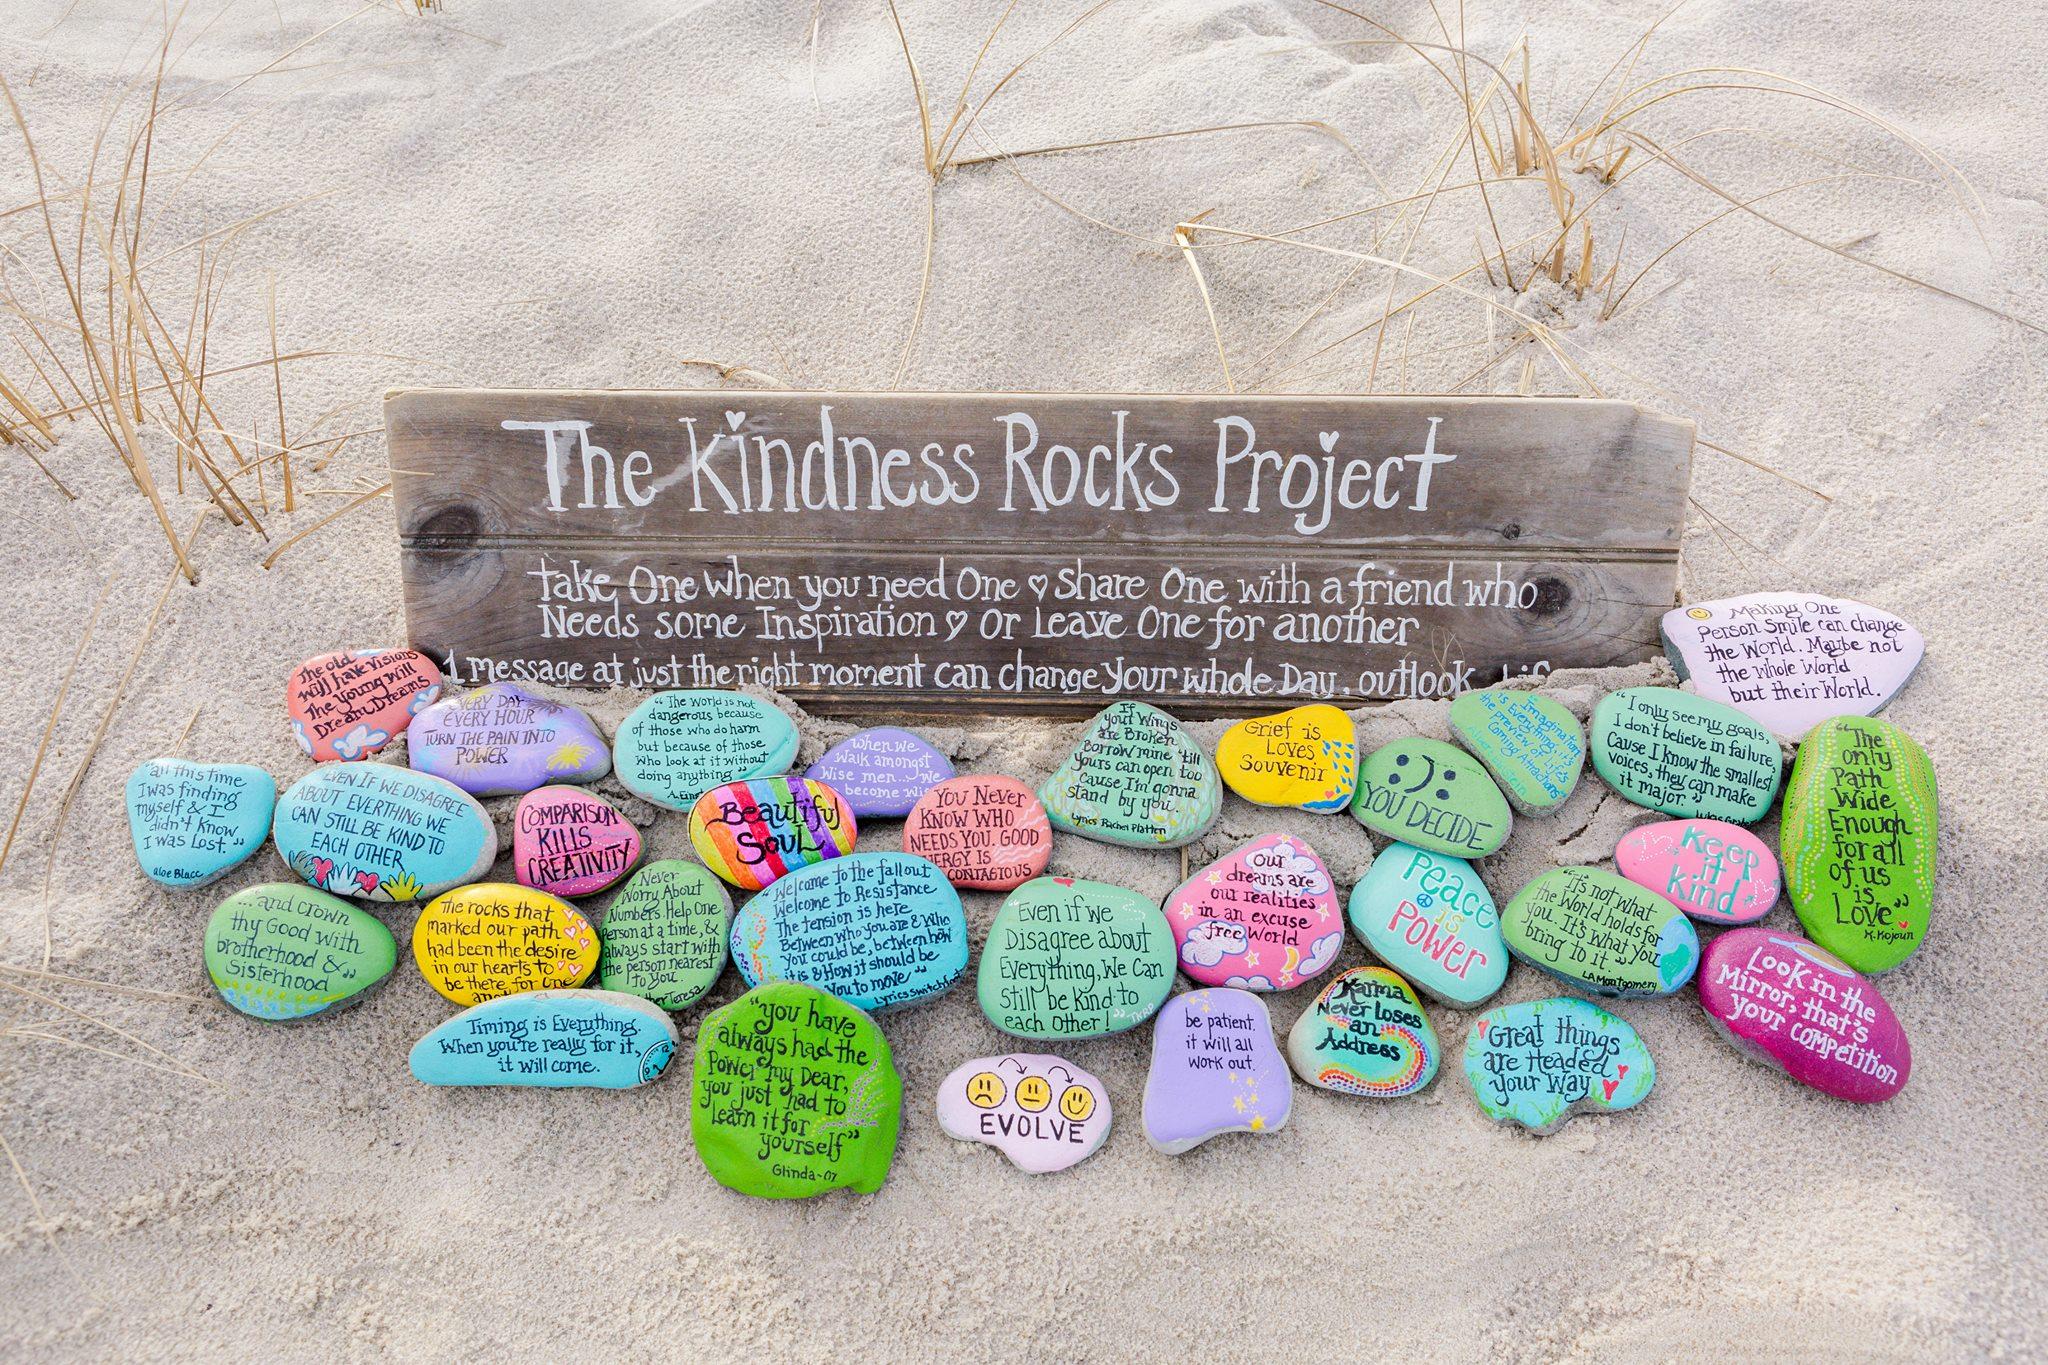 The Kindness Rocks Project